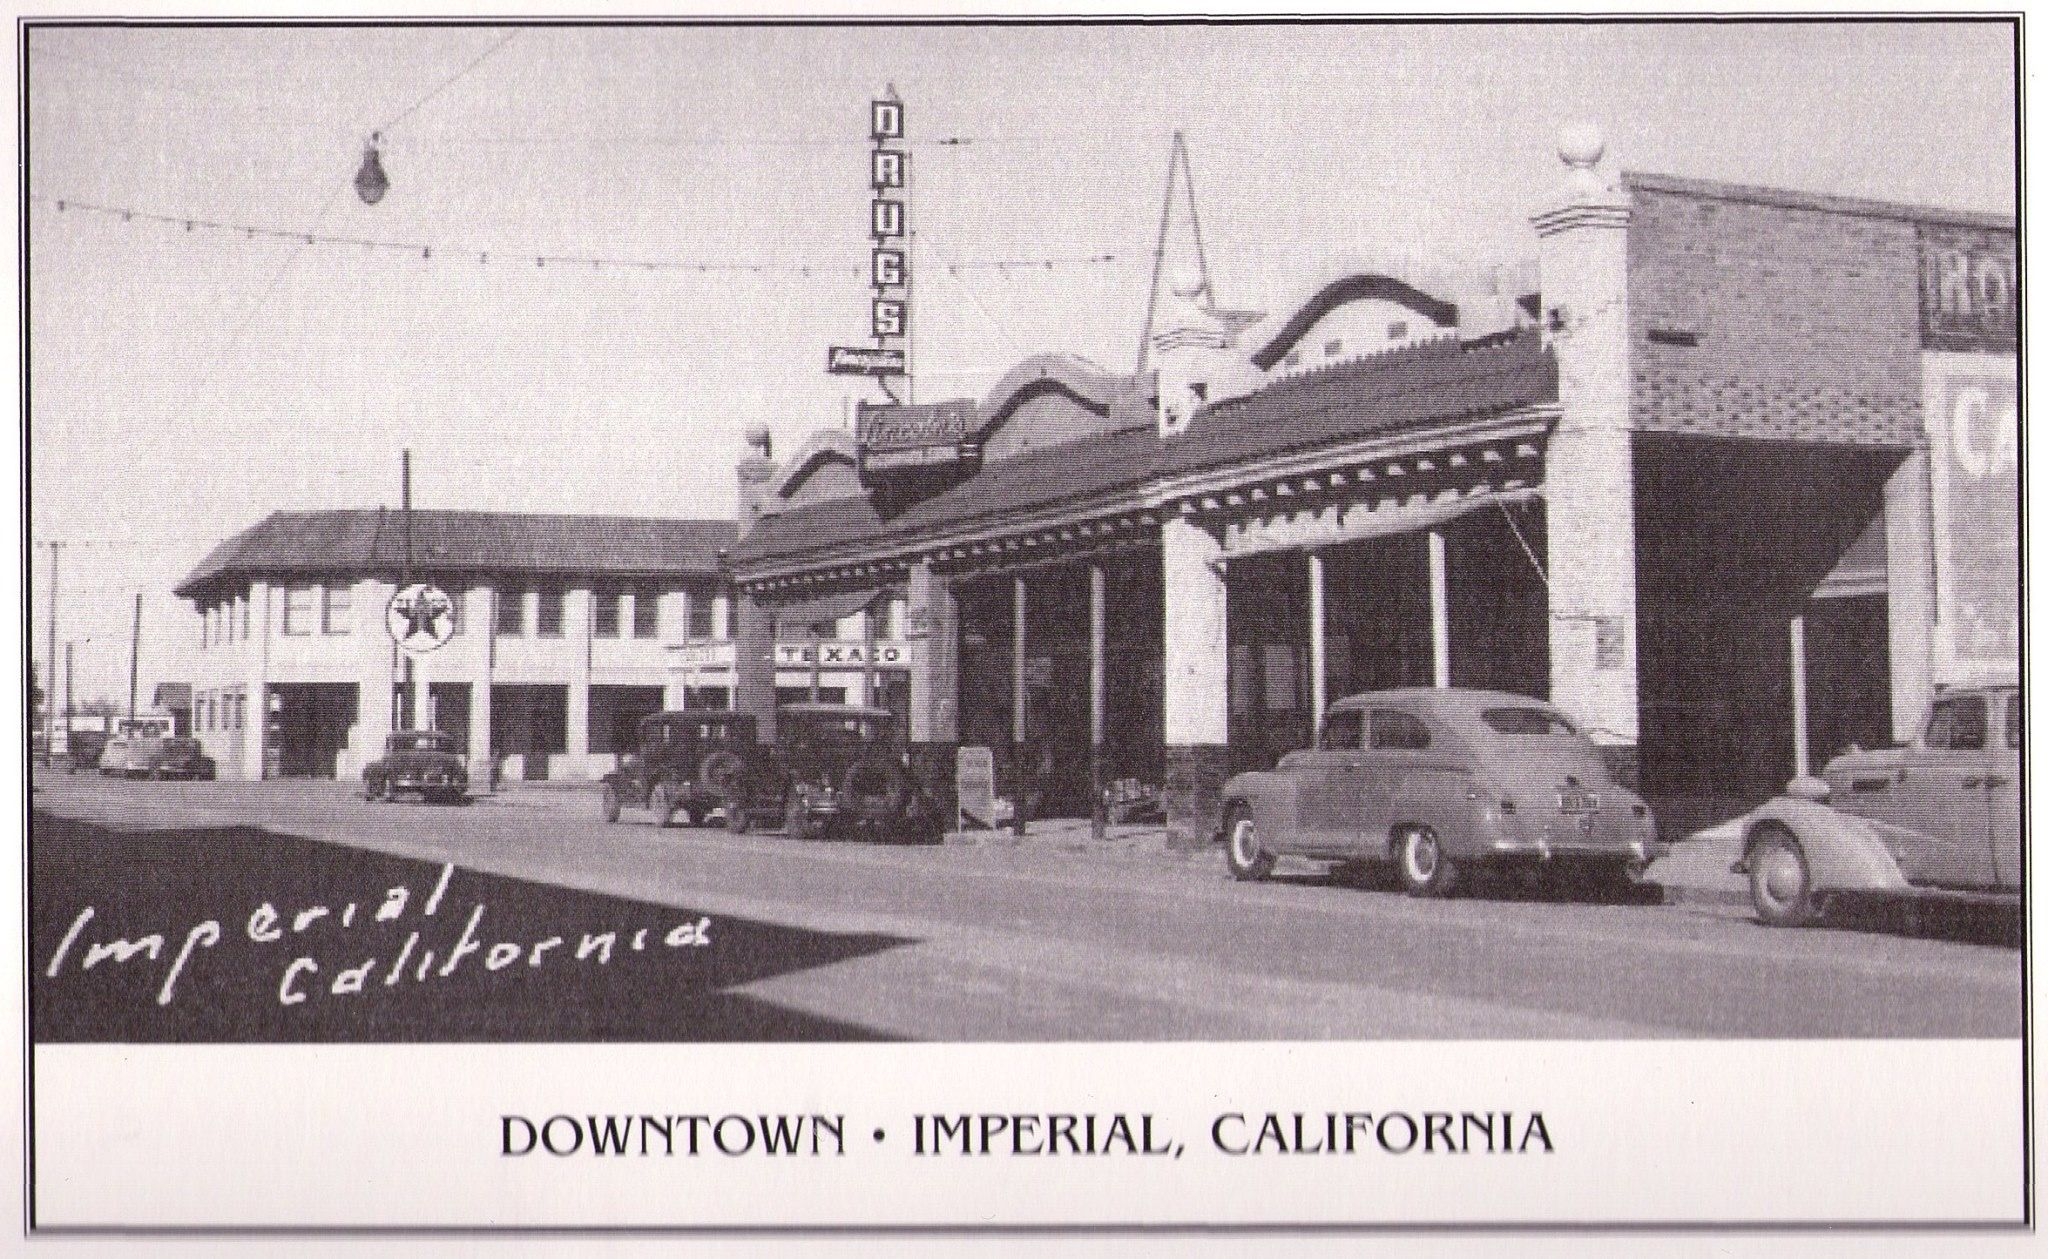 Down Town Brawley CA BRAWLEY CA My hometown